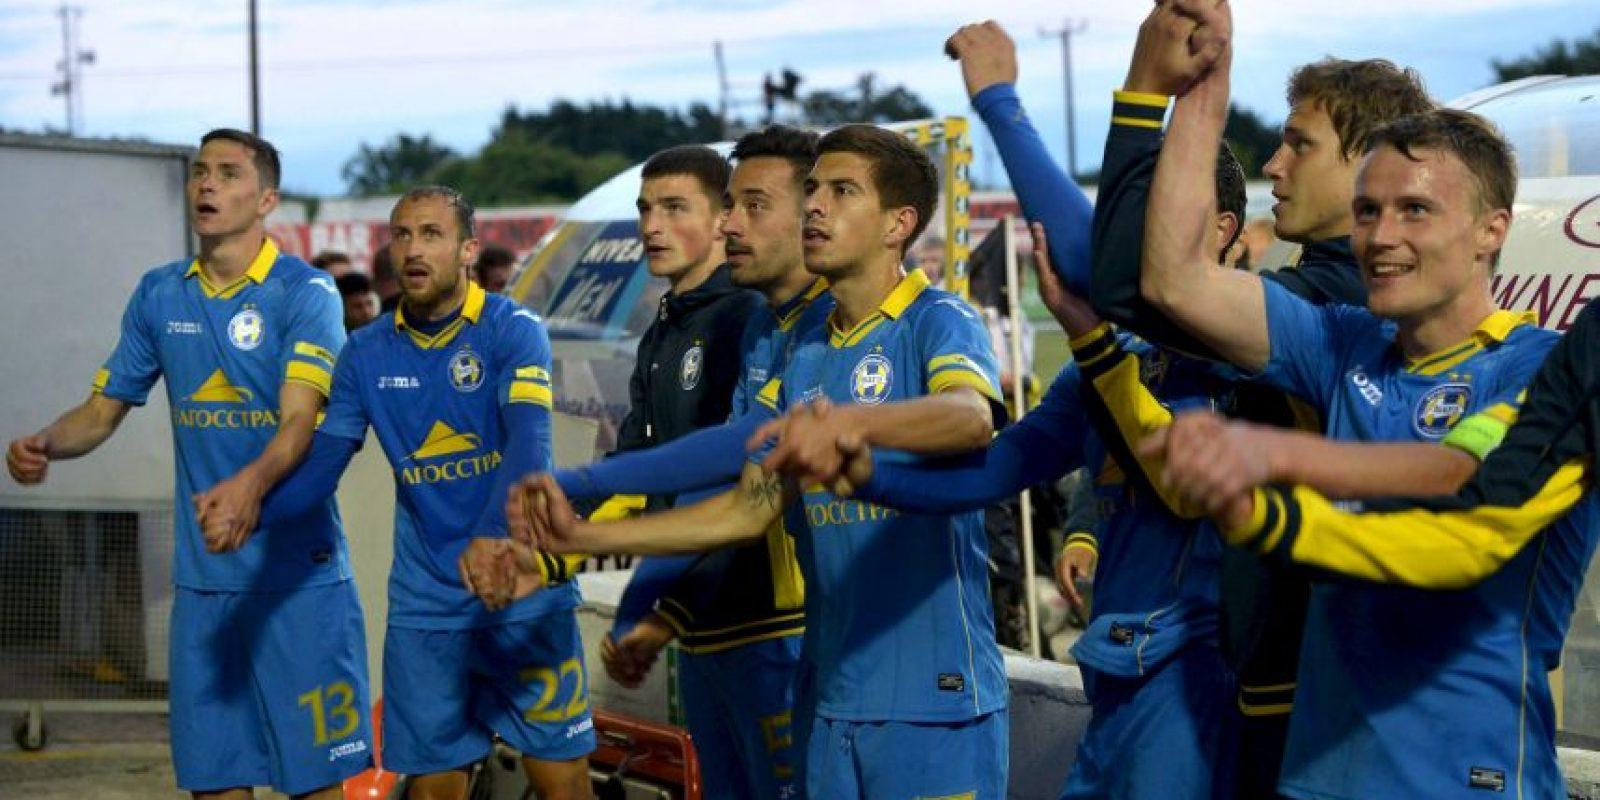 2. BATE Borisov (Ucrania) / 18.20 millones de euros. Foto:Getty Images